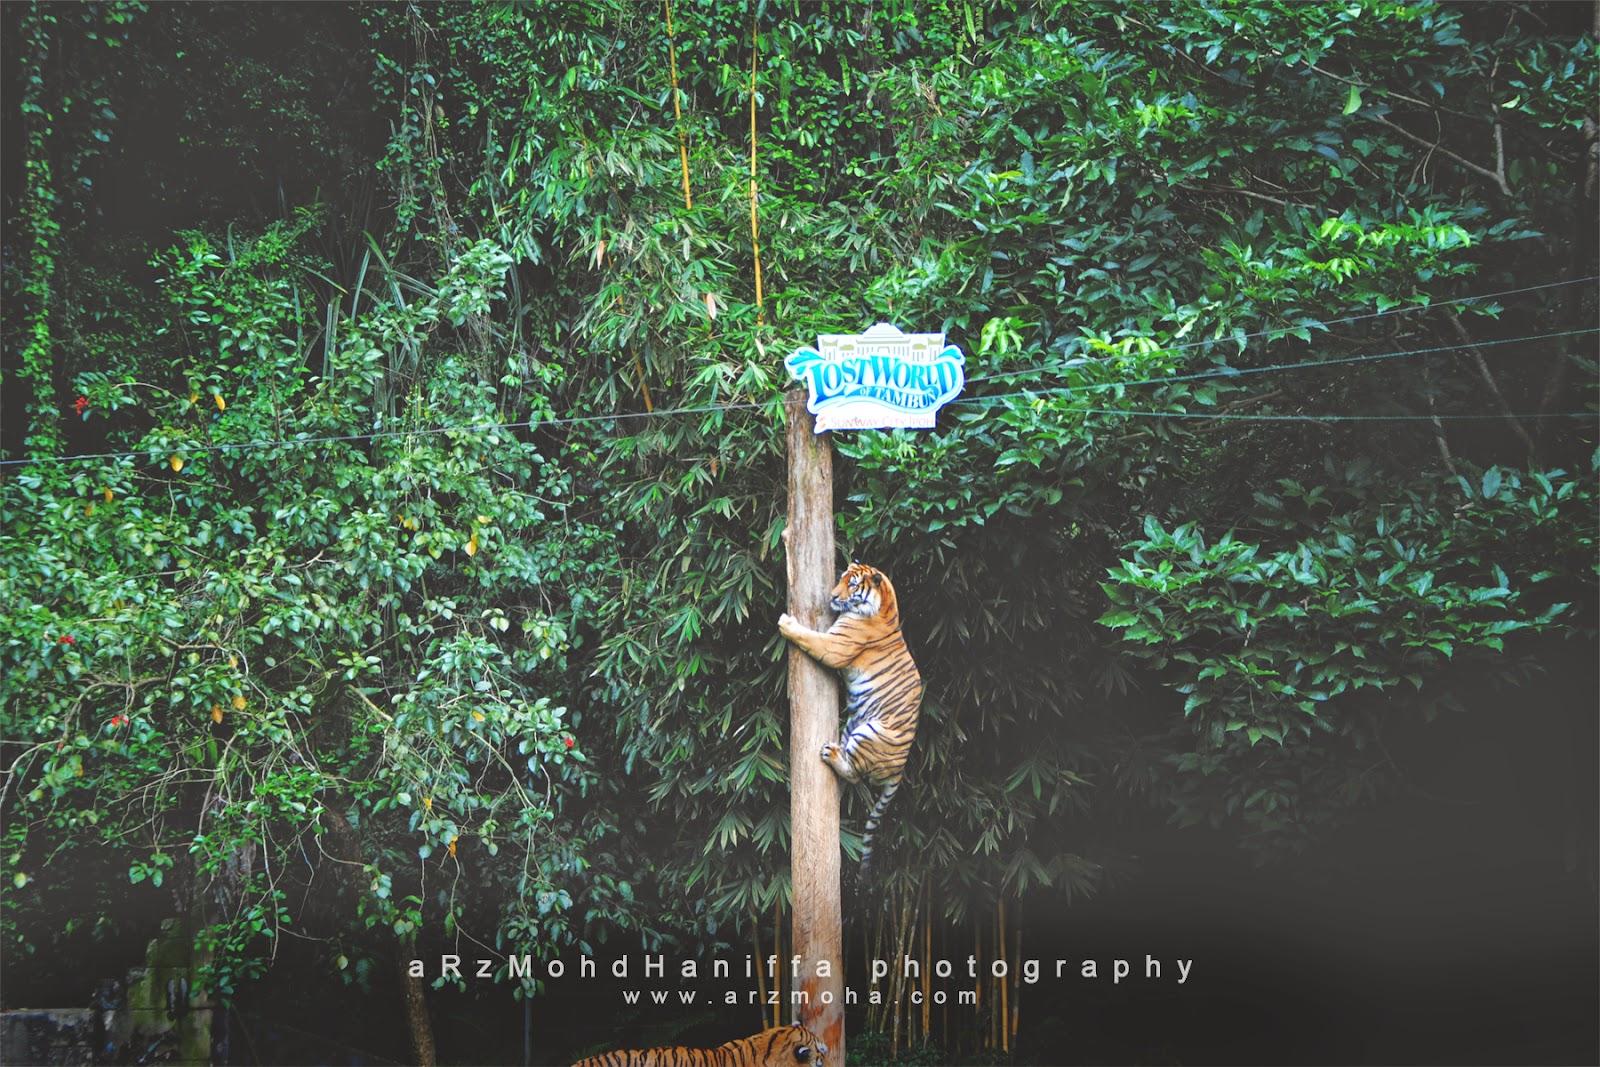 tiger, harimau, tips, vmy2014, jom cuti, visit malaysia 2014, gambar cantik